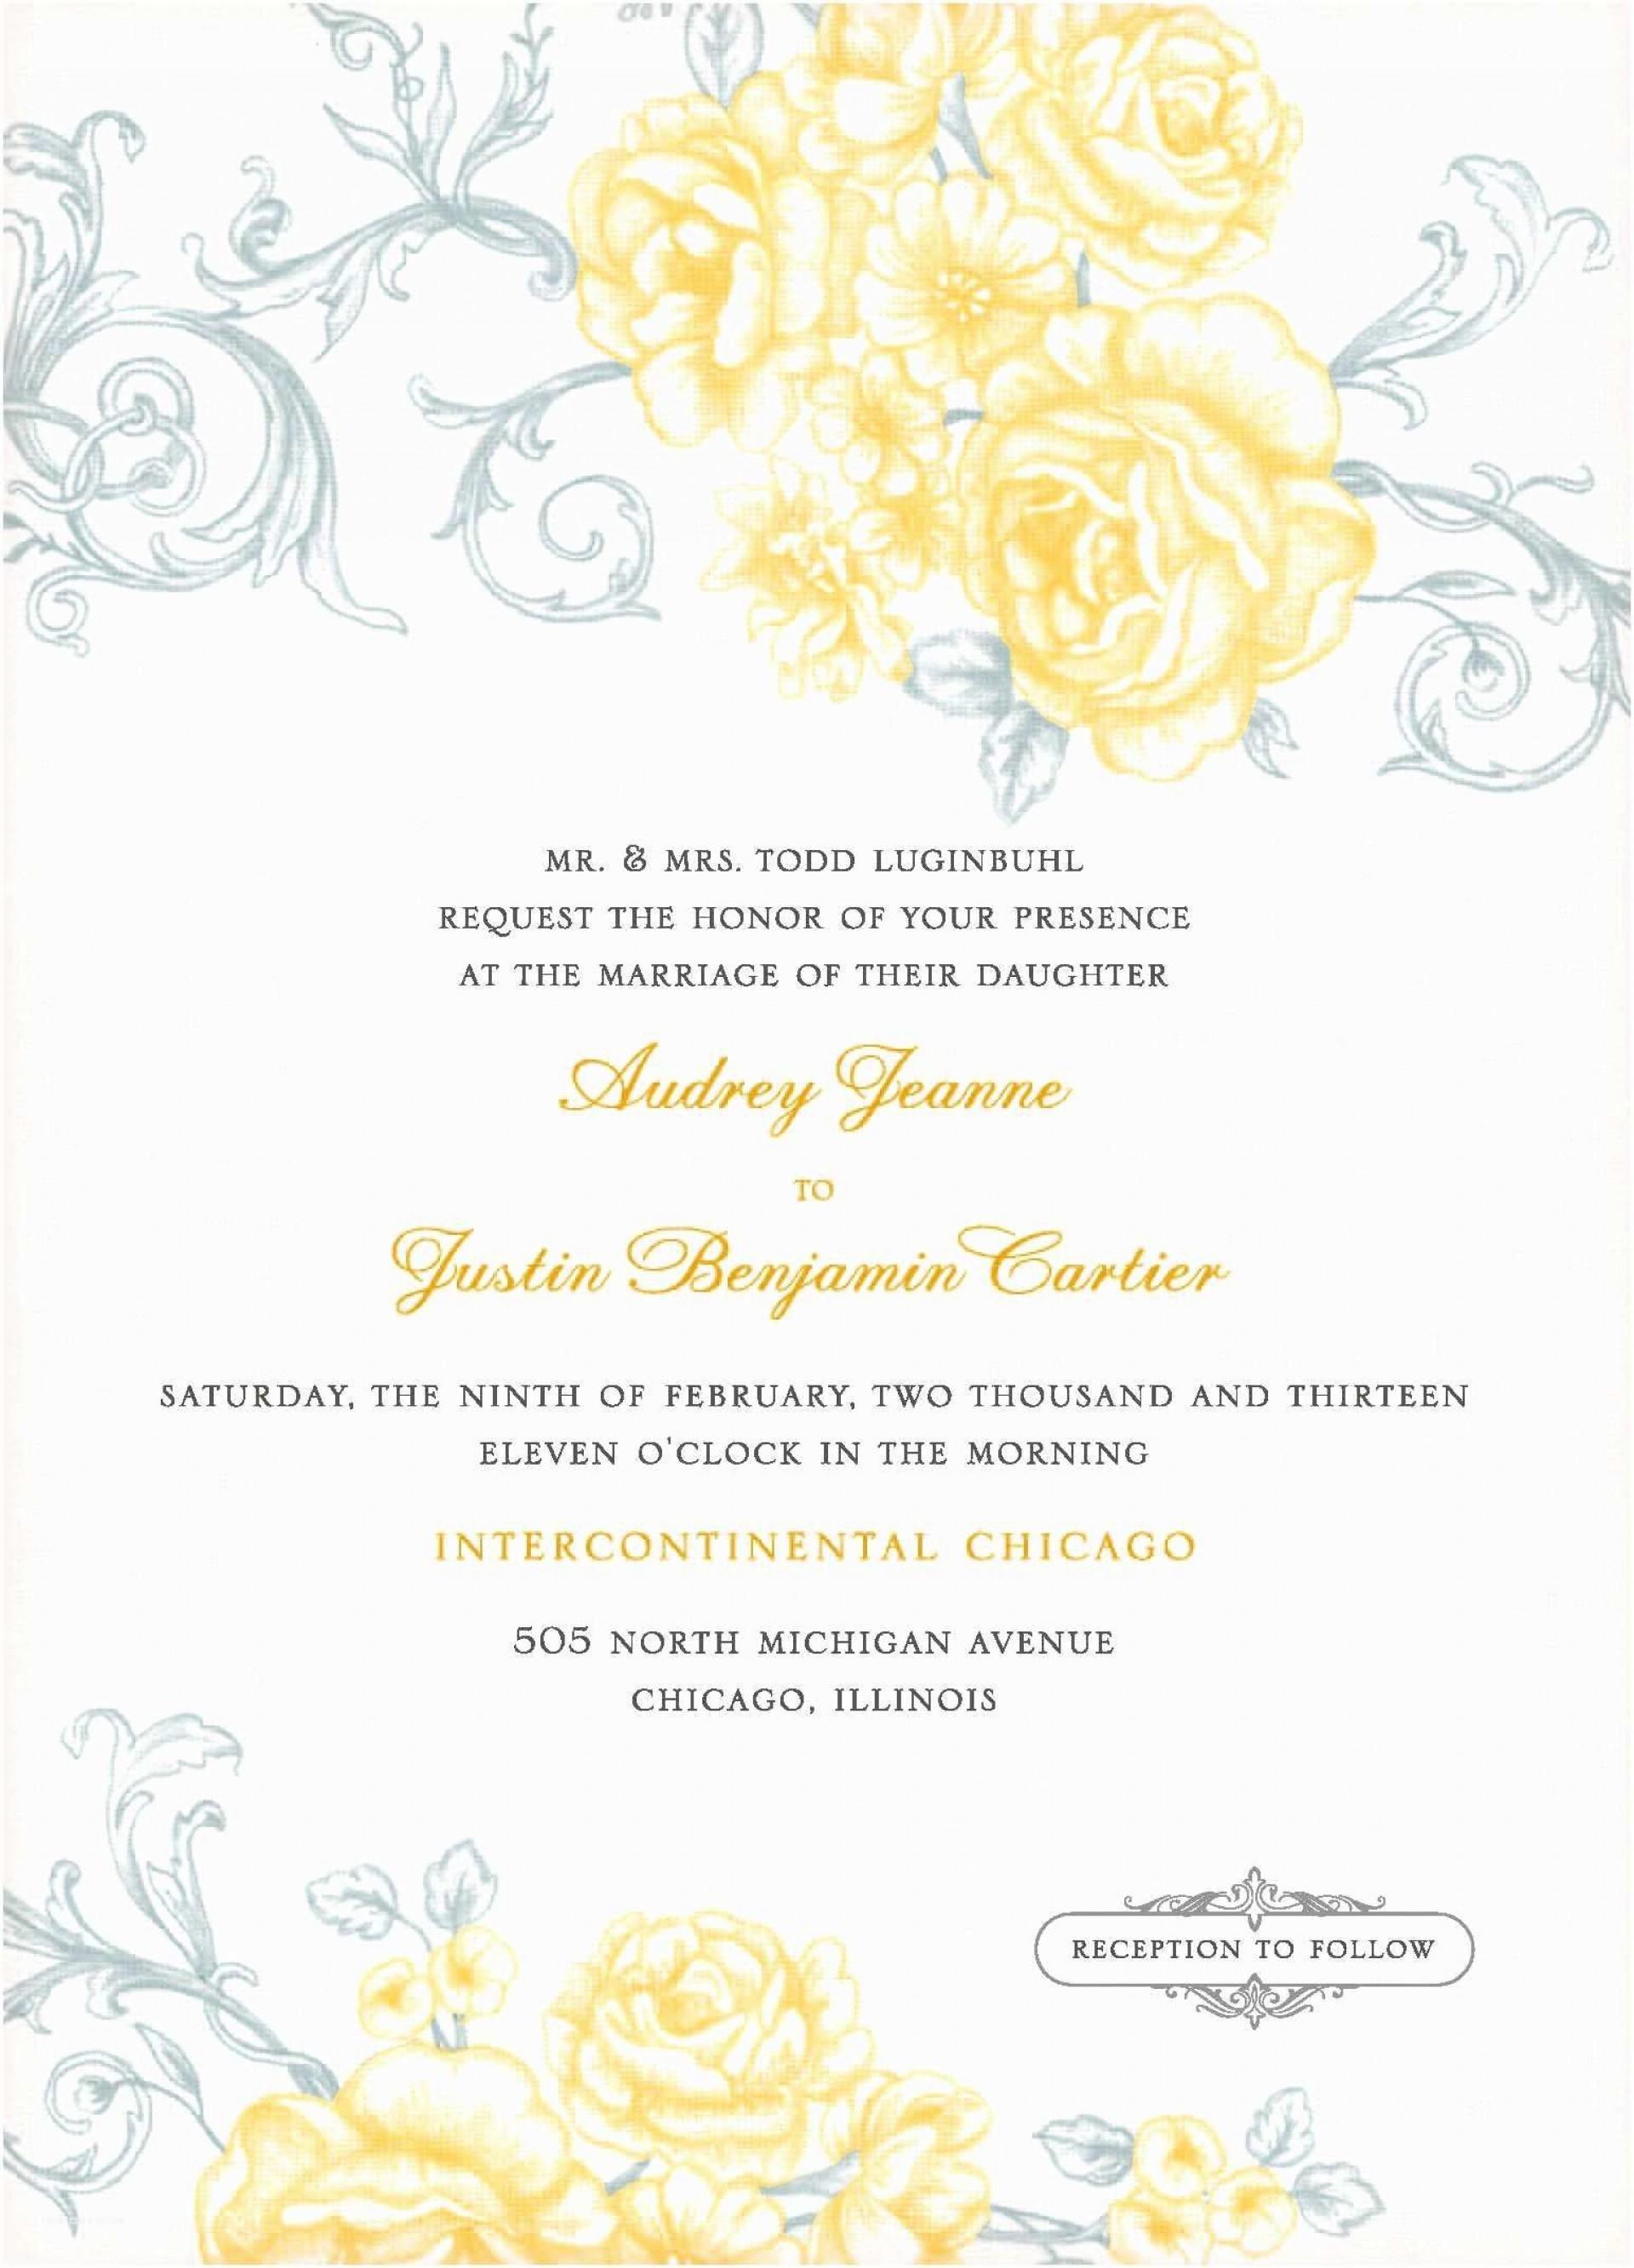 005 Impressive Free Wedding Template For Word Highest Clarity  Invitation In Marathi Menu1920